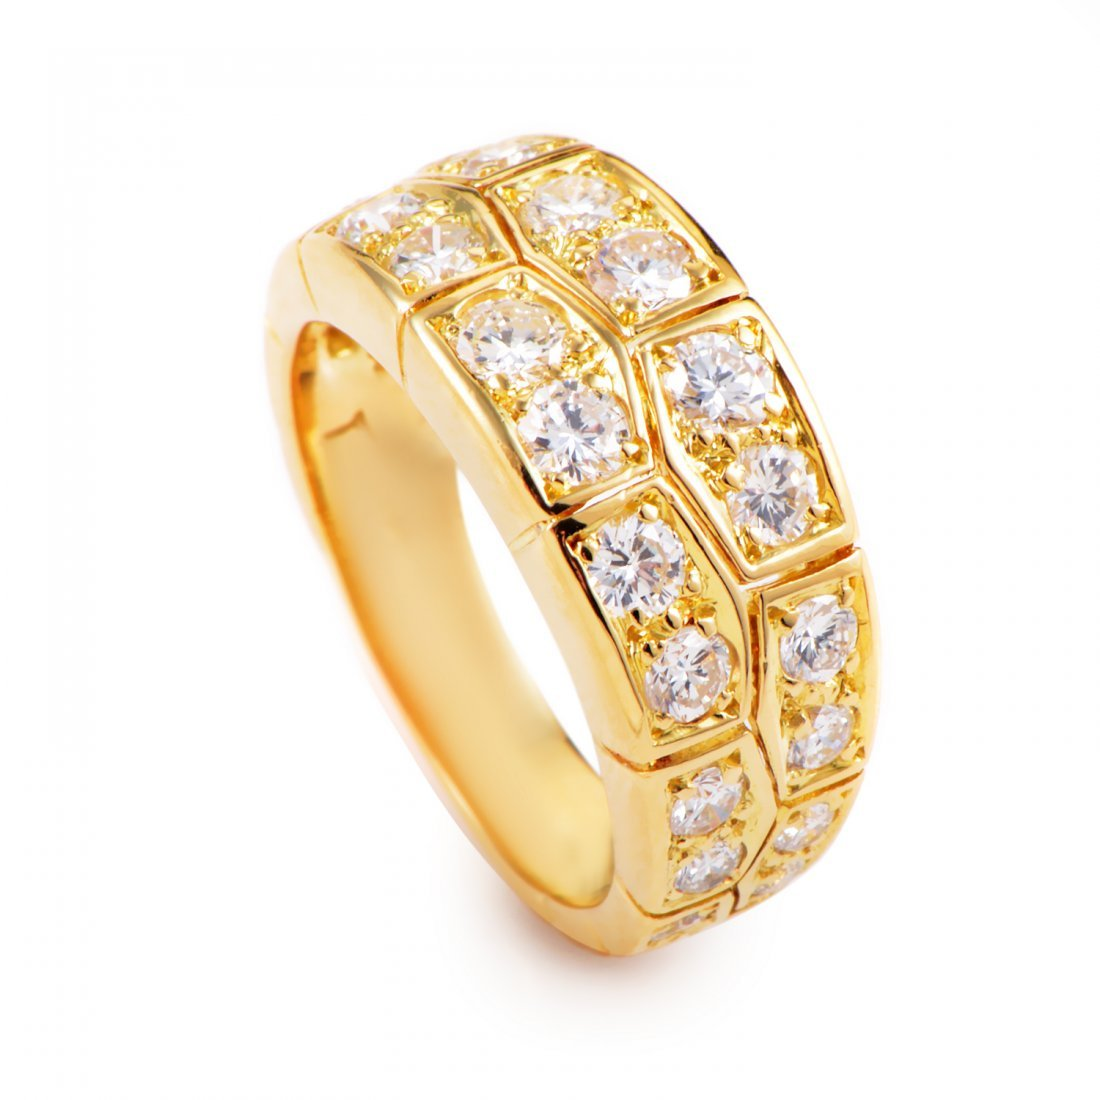 Van Cleef & Arpels Tiled 18K Yellow Gold Diamond Band